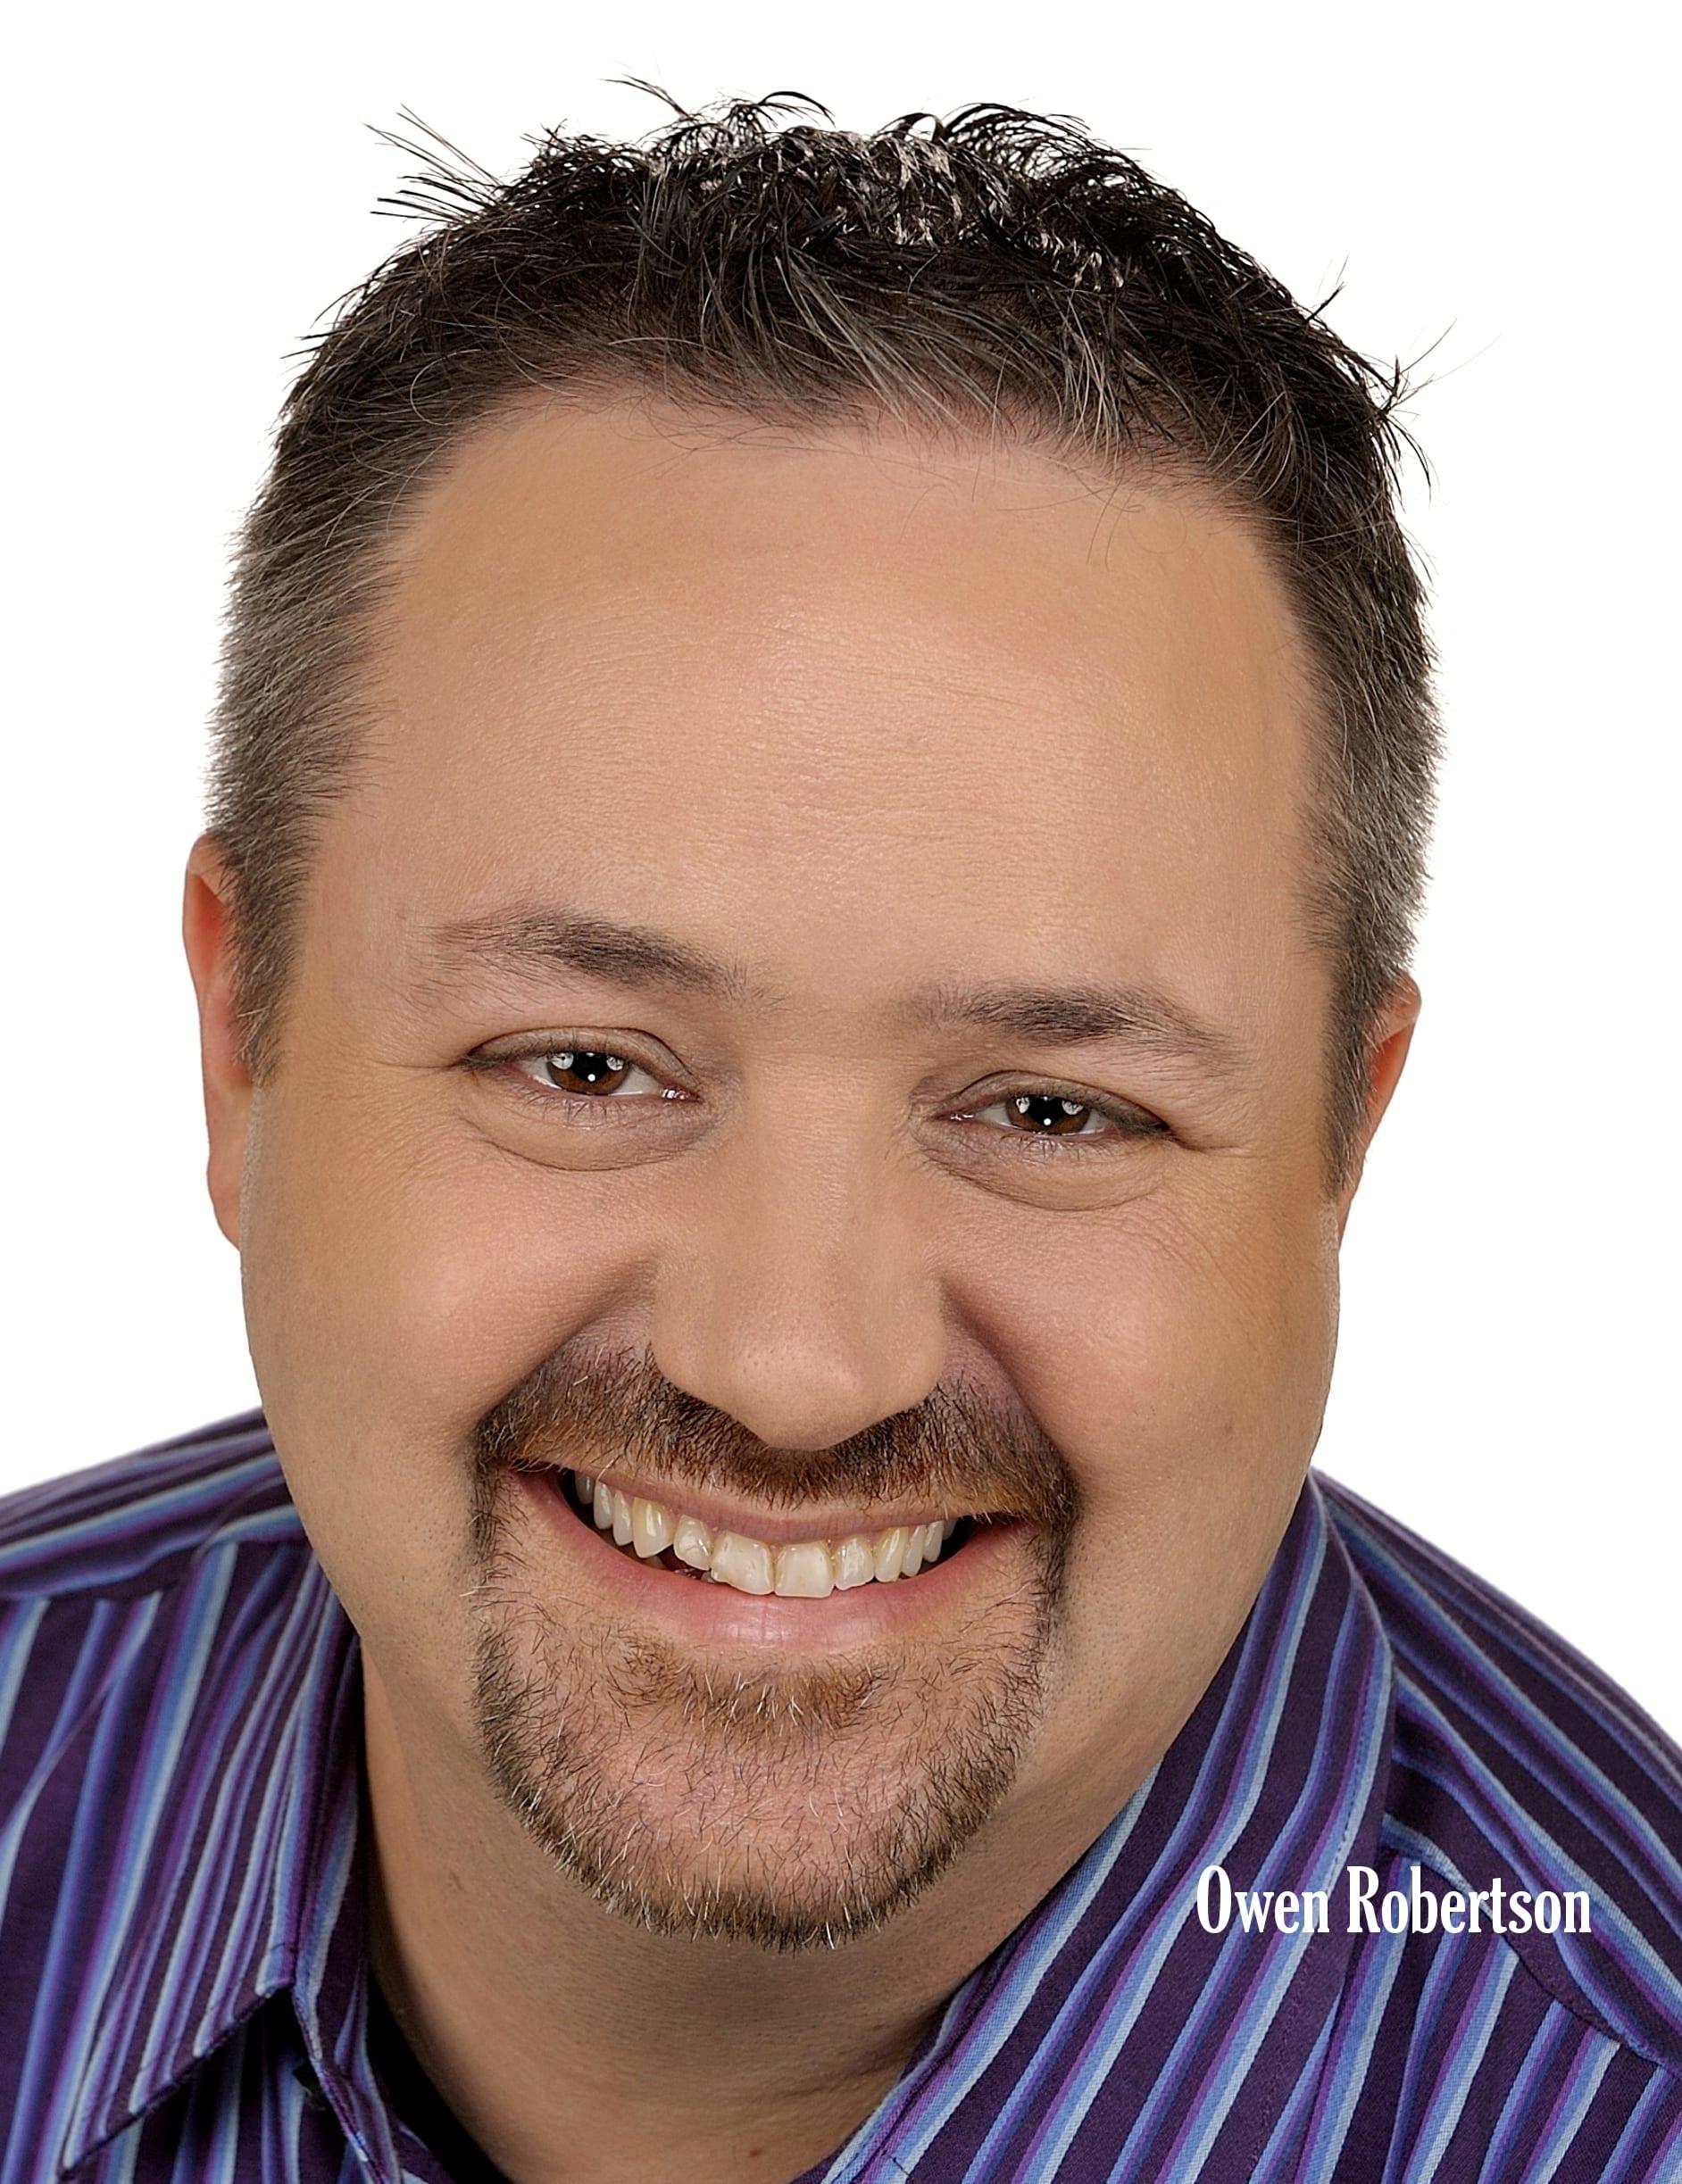 Headshot of Owen Reobertson